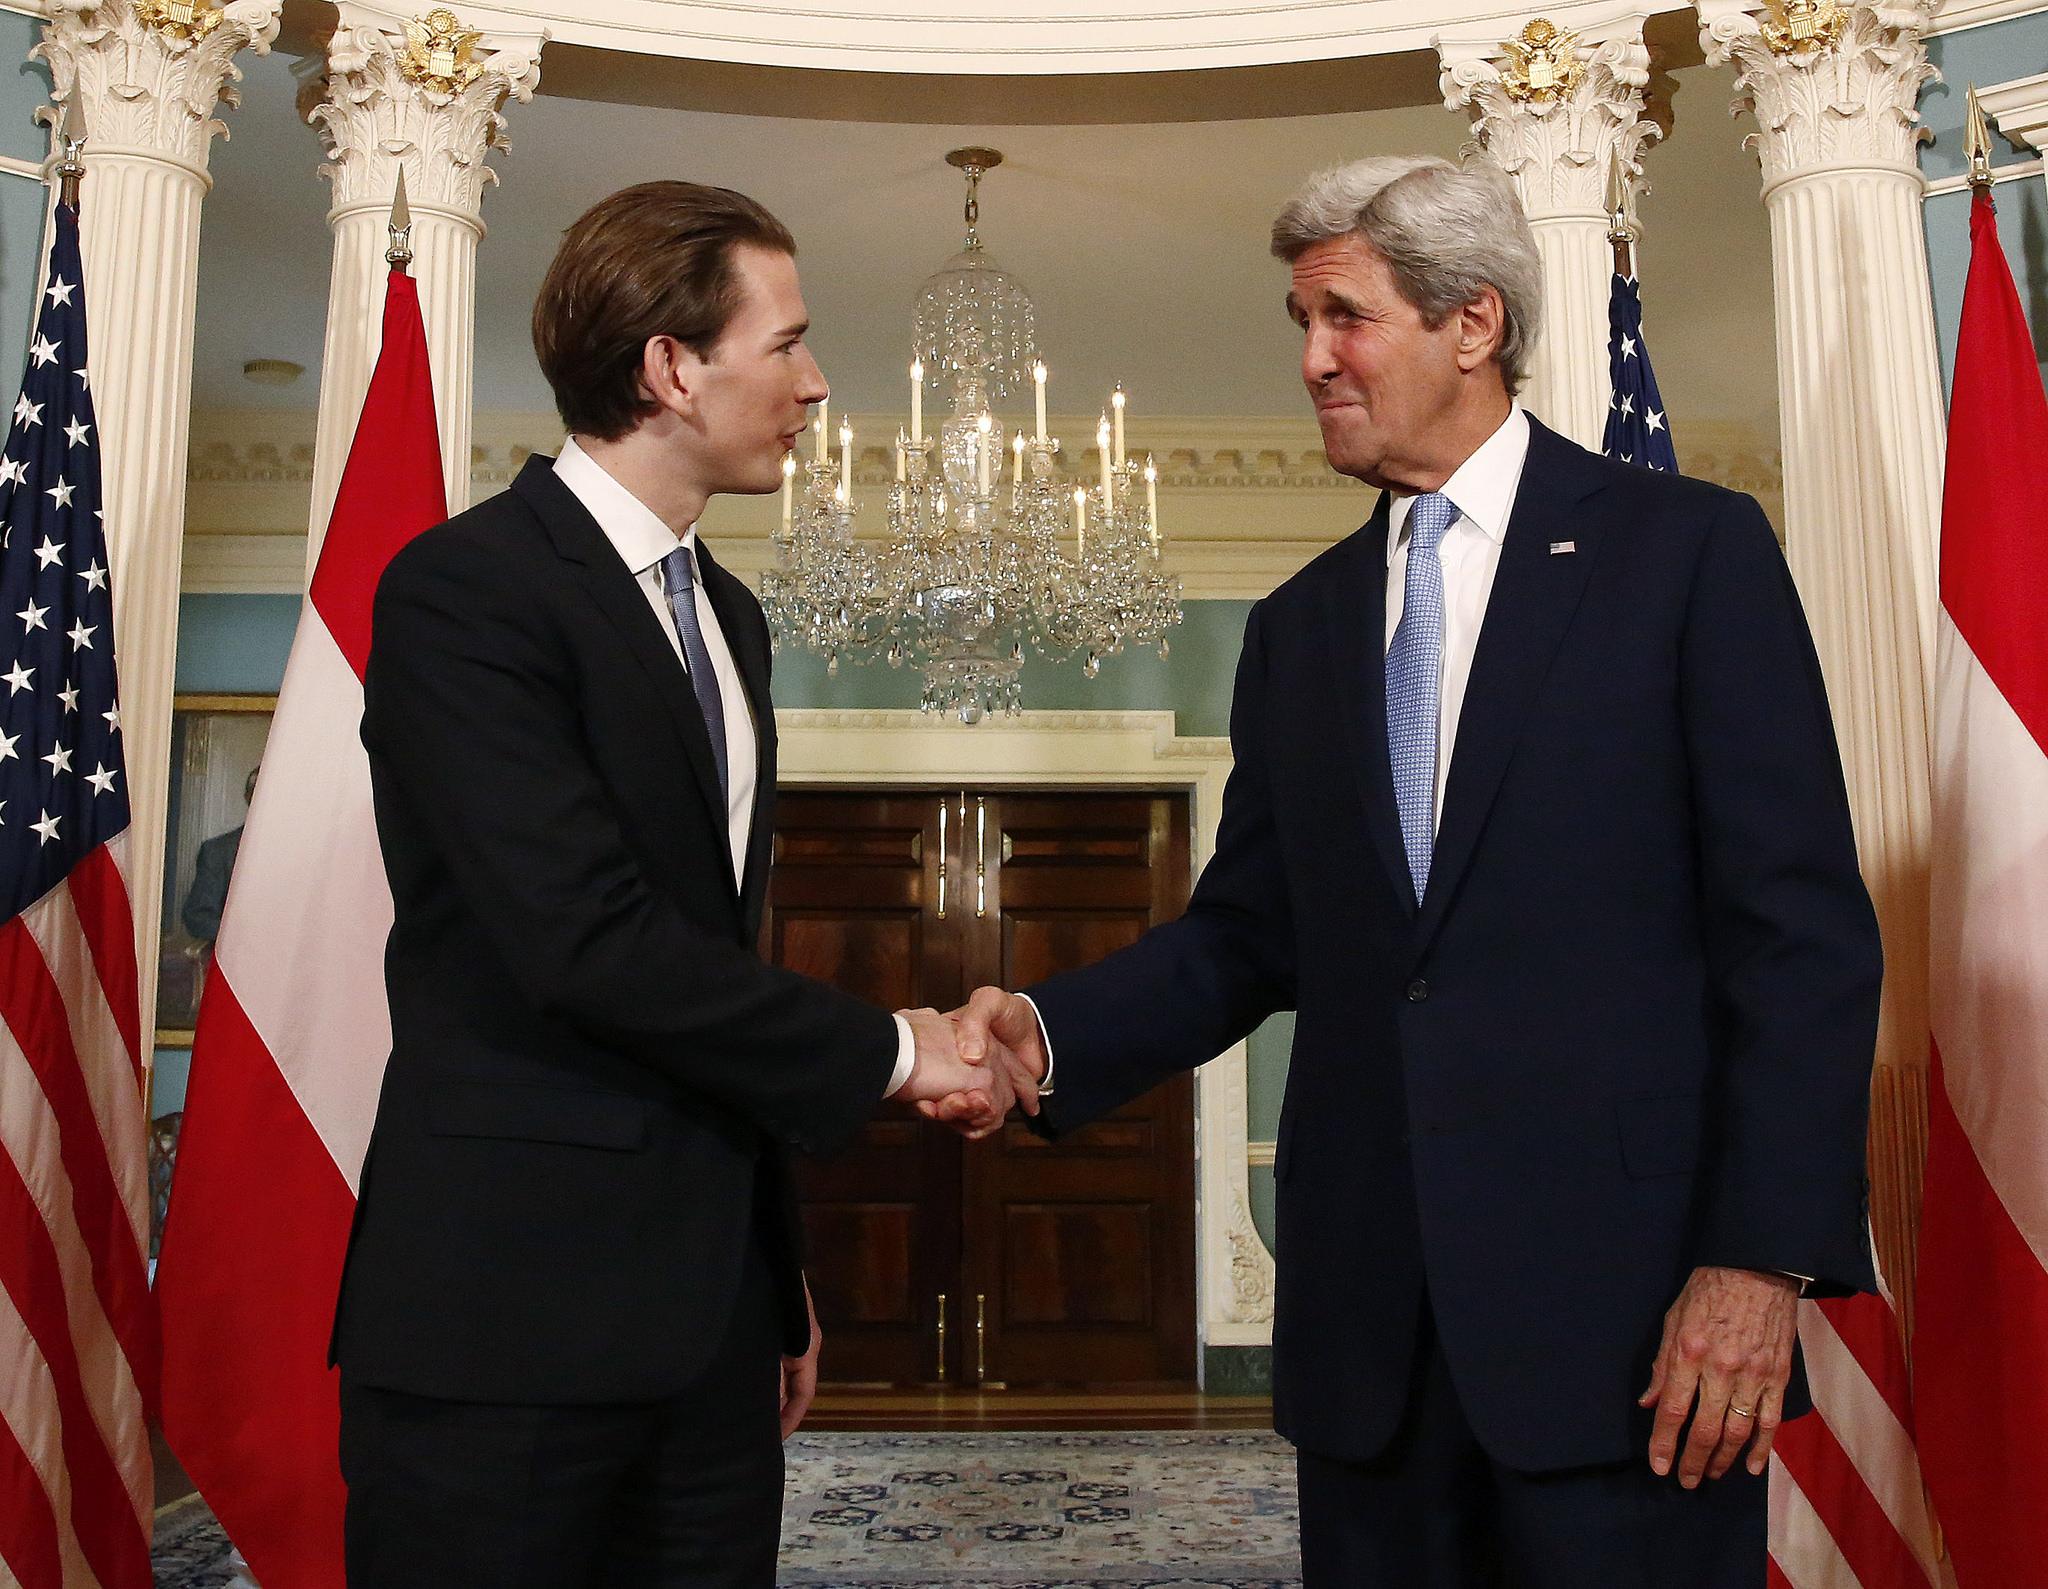 FM Kurz & Secretary Kerry. Photo: Dragan Tatic